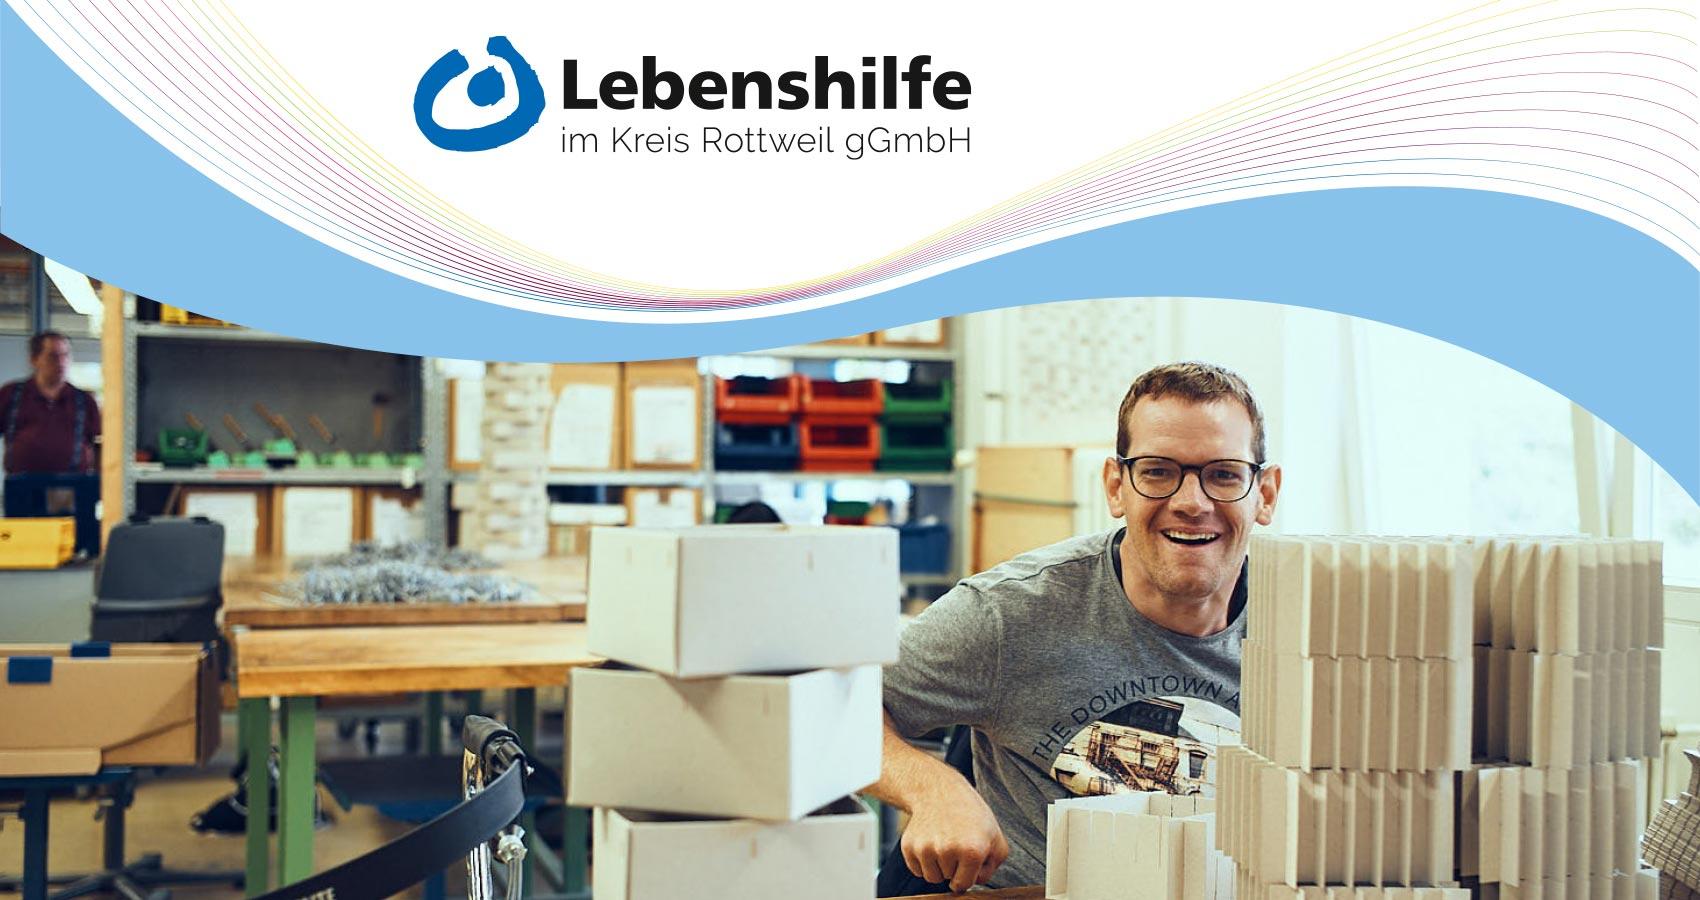 Lebenshilfe im Kreis Rottweil gGmbH - Arbeitsbereich Papier